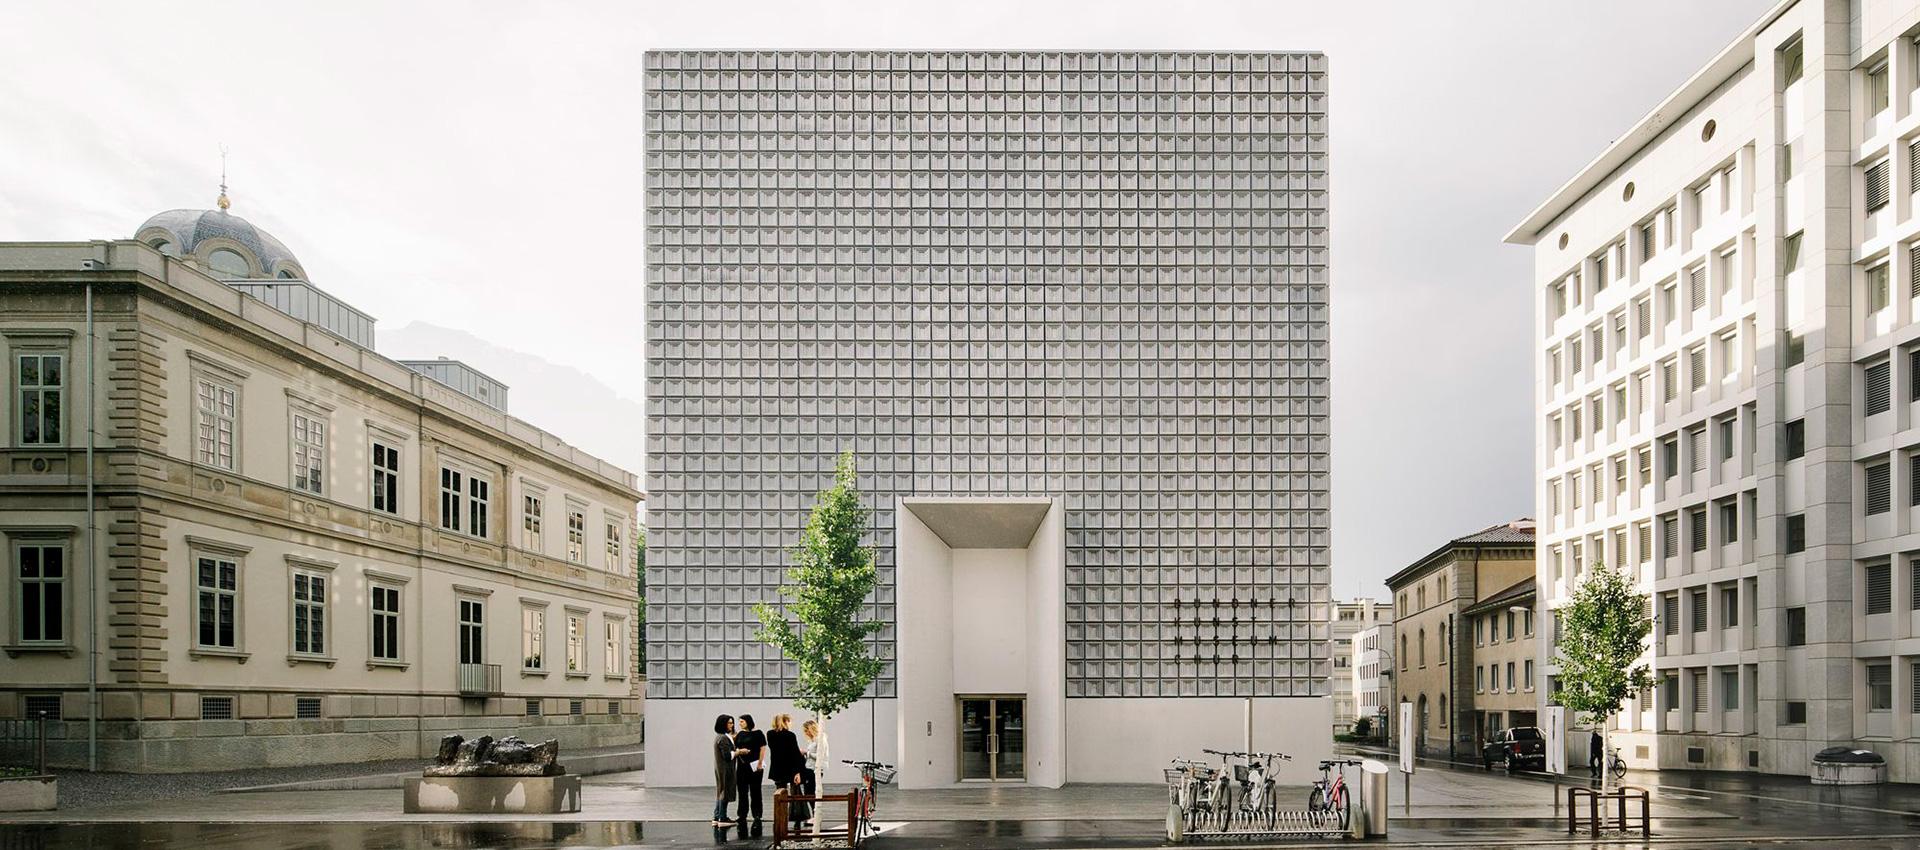 Bündner Kunstmuseum by Barozzi&Veiga. Photography © Simon Menges